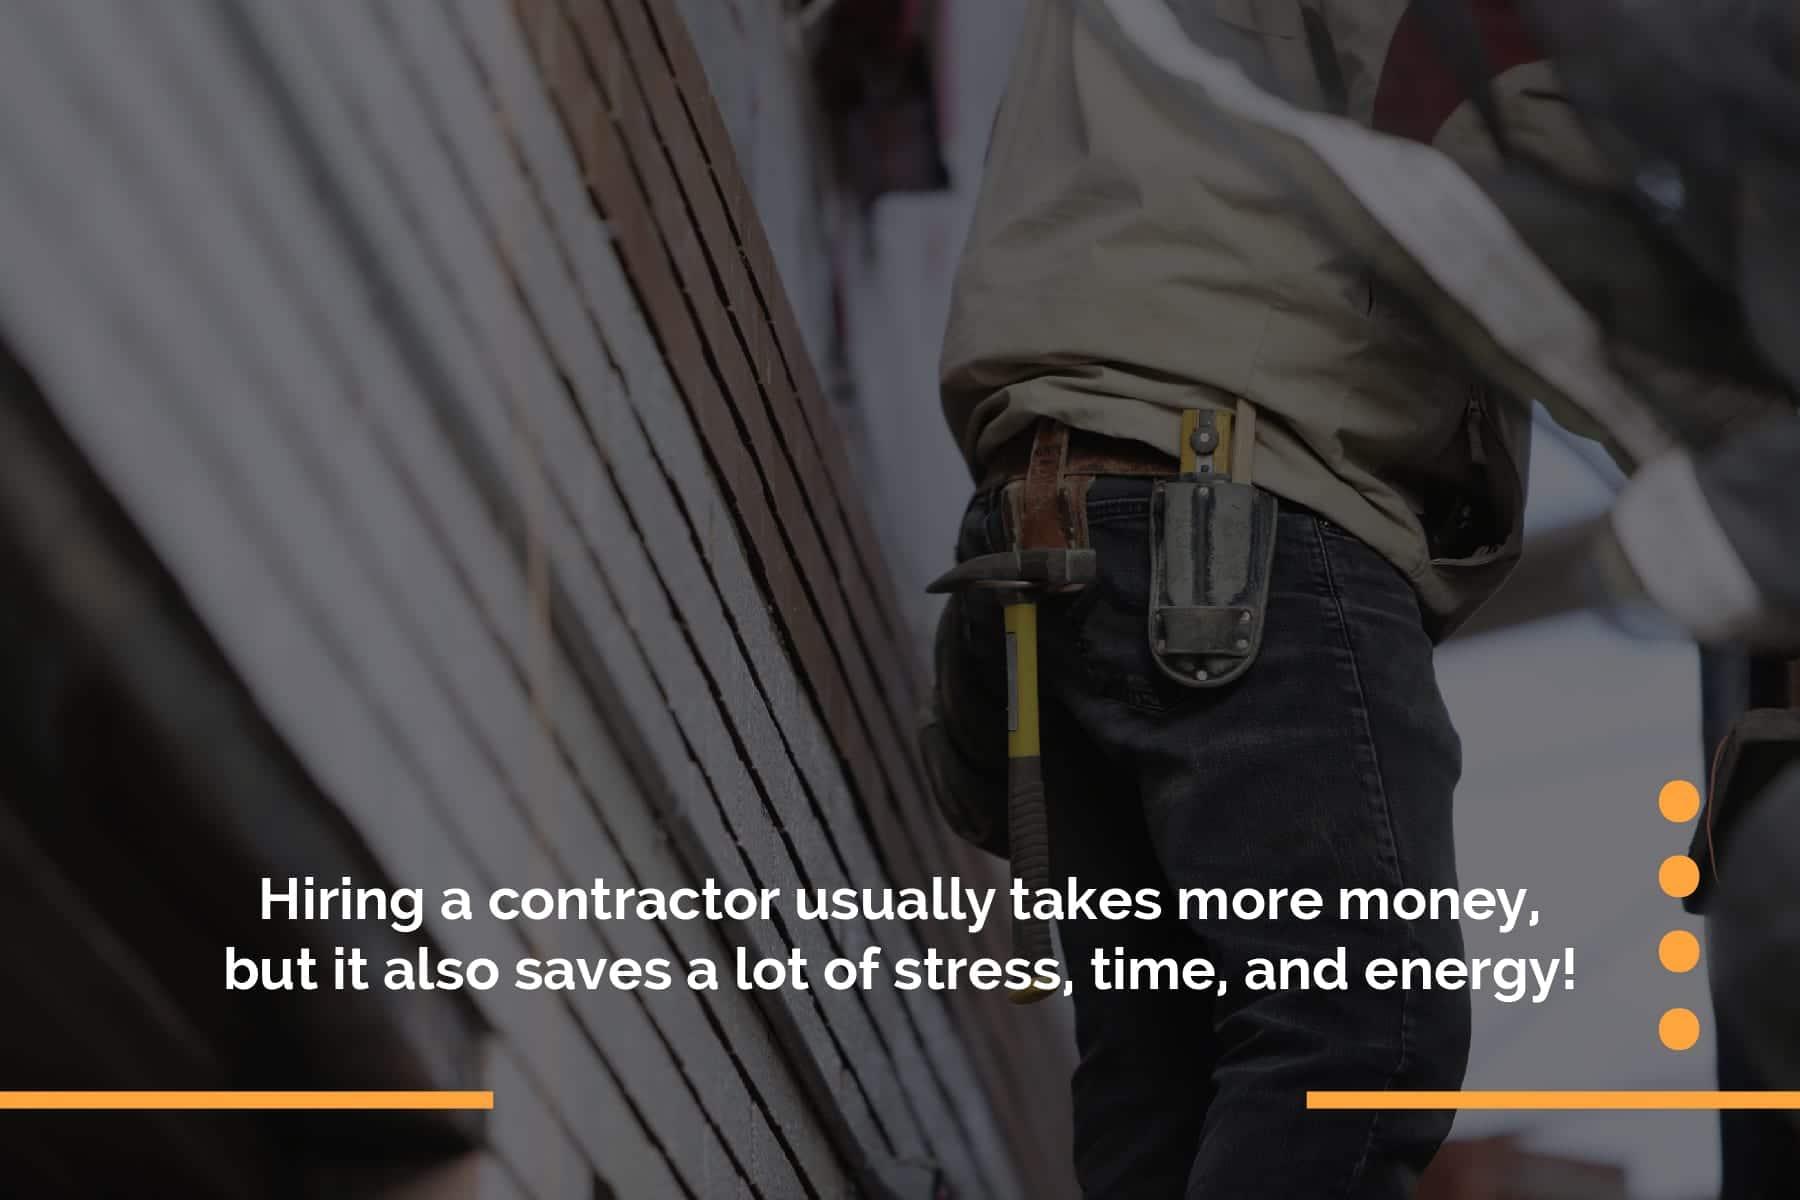 hiringacontractorusuallytakes